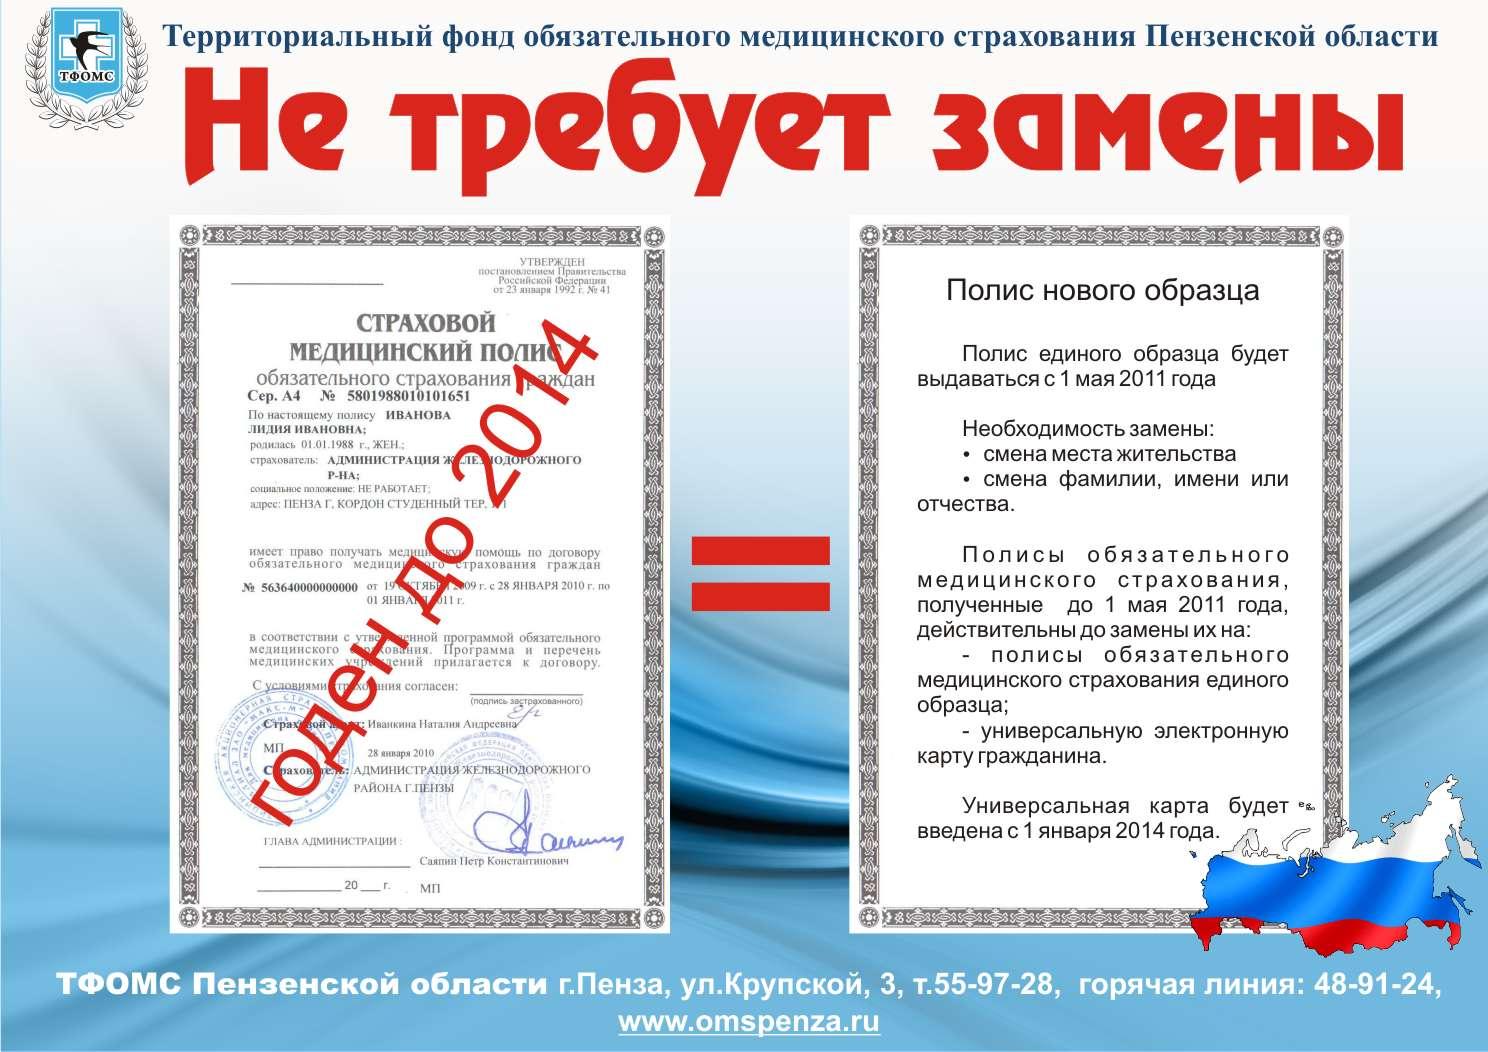 Цена visa platinum карта пластиковая Краснодар